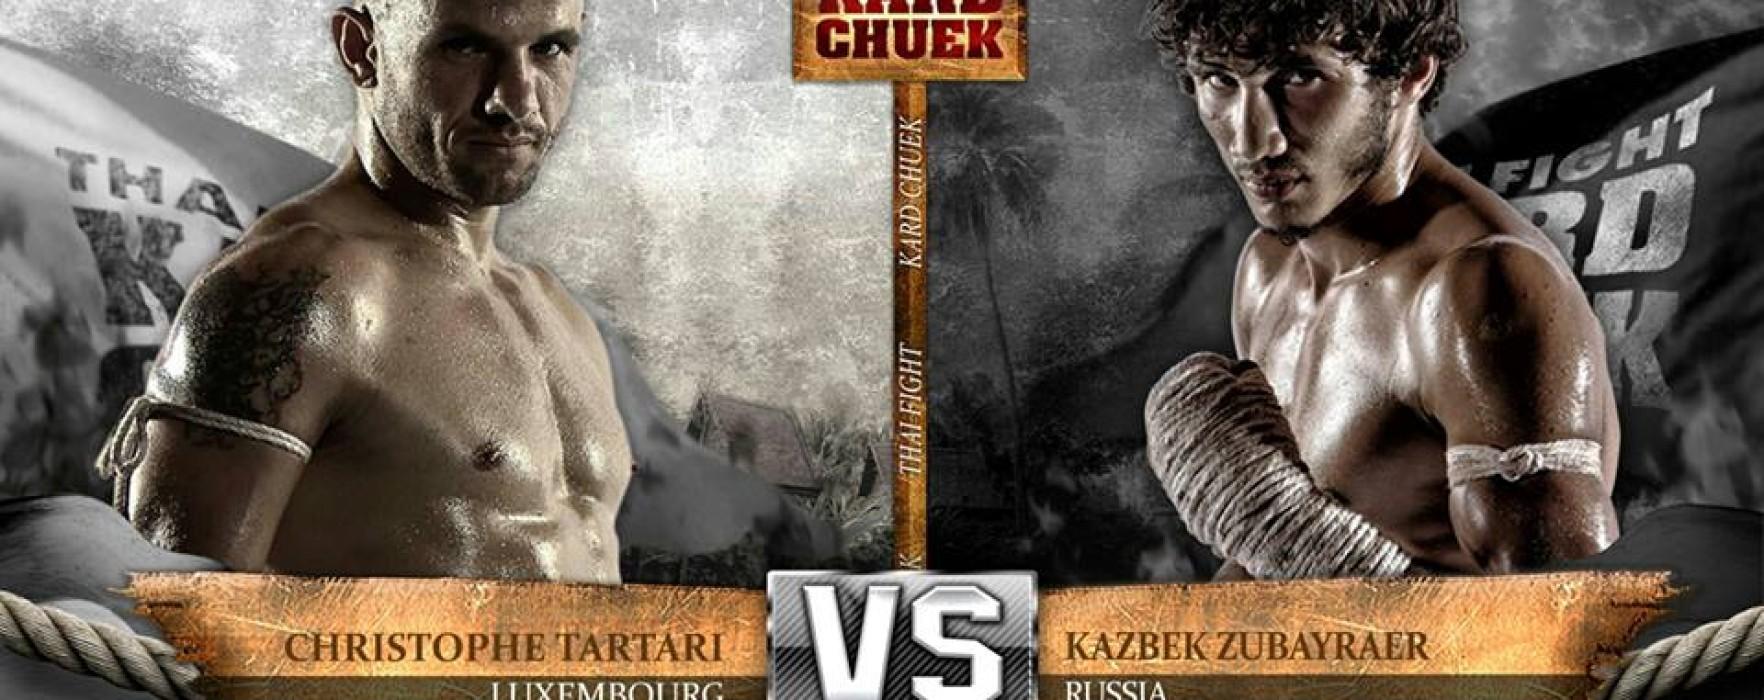 Third episode of Thai Fight Kard Chuek